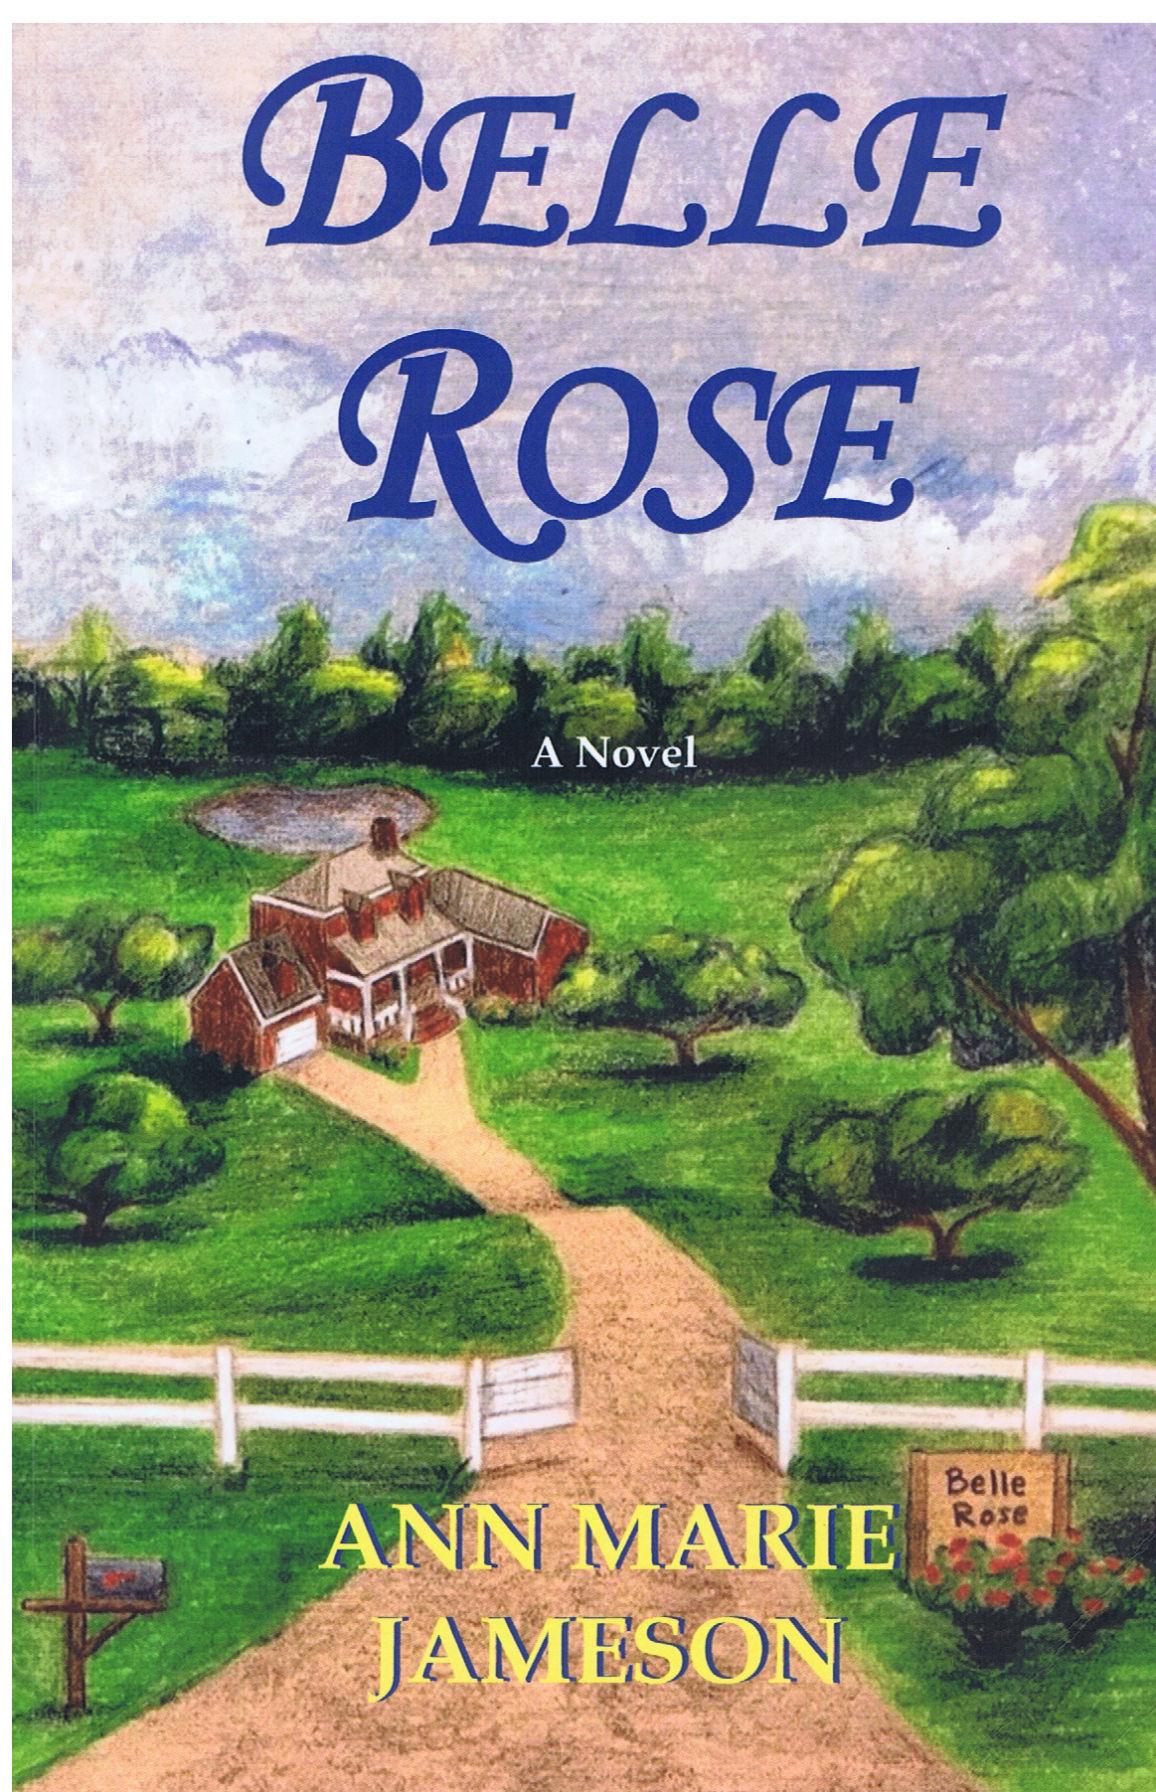 Belle Rose Cover 1 copy.jpg (group)